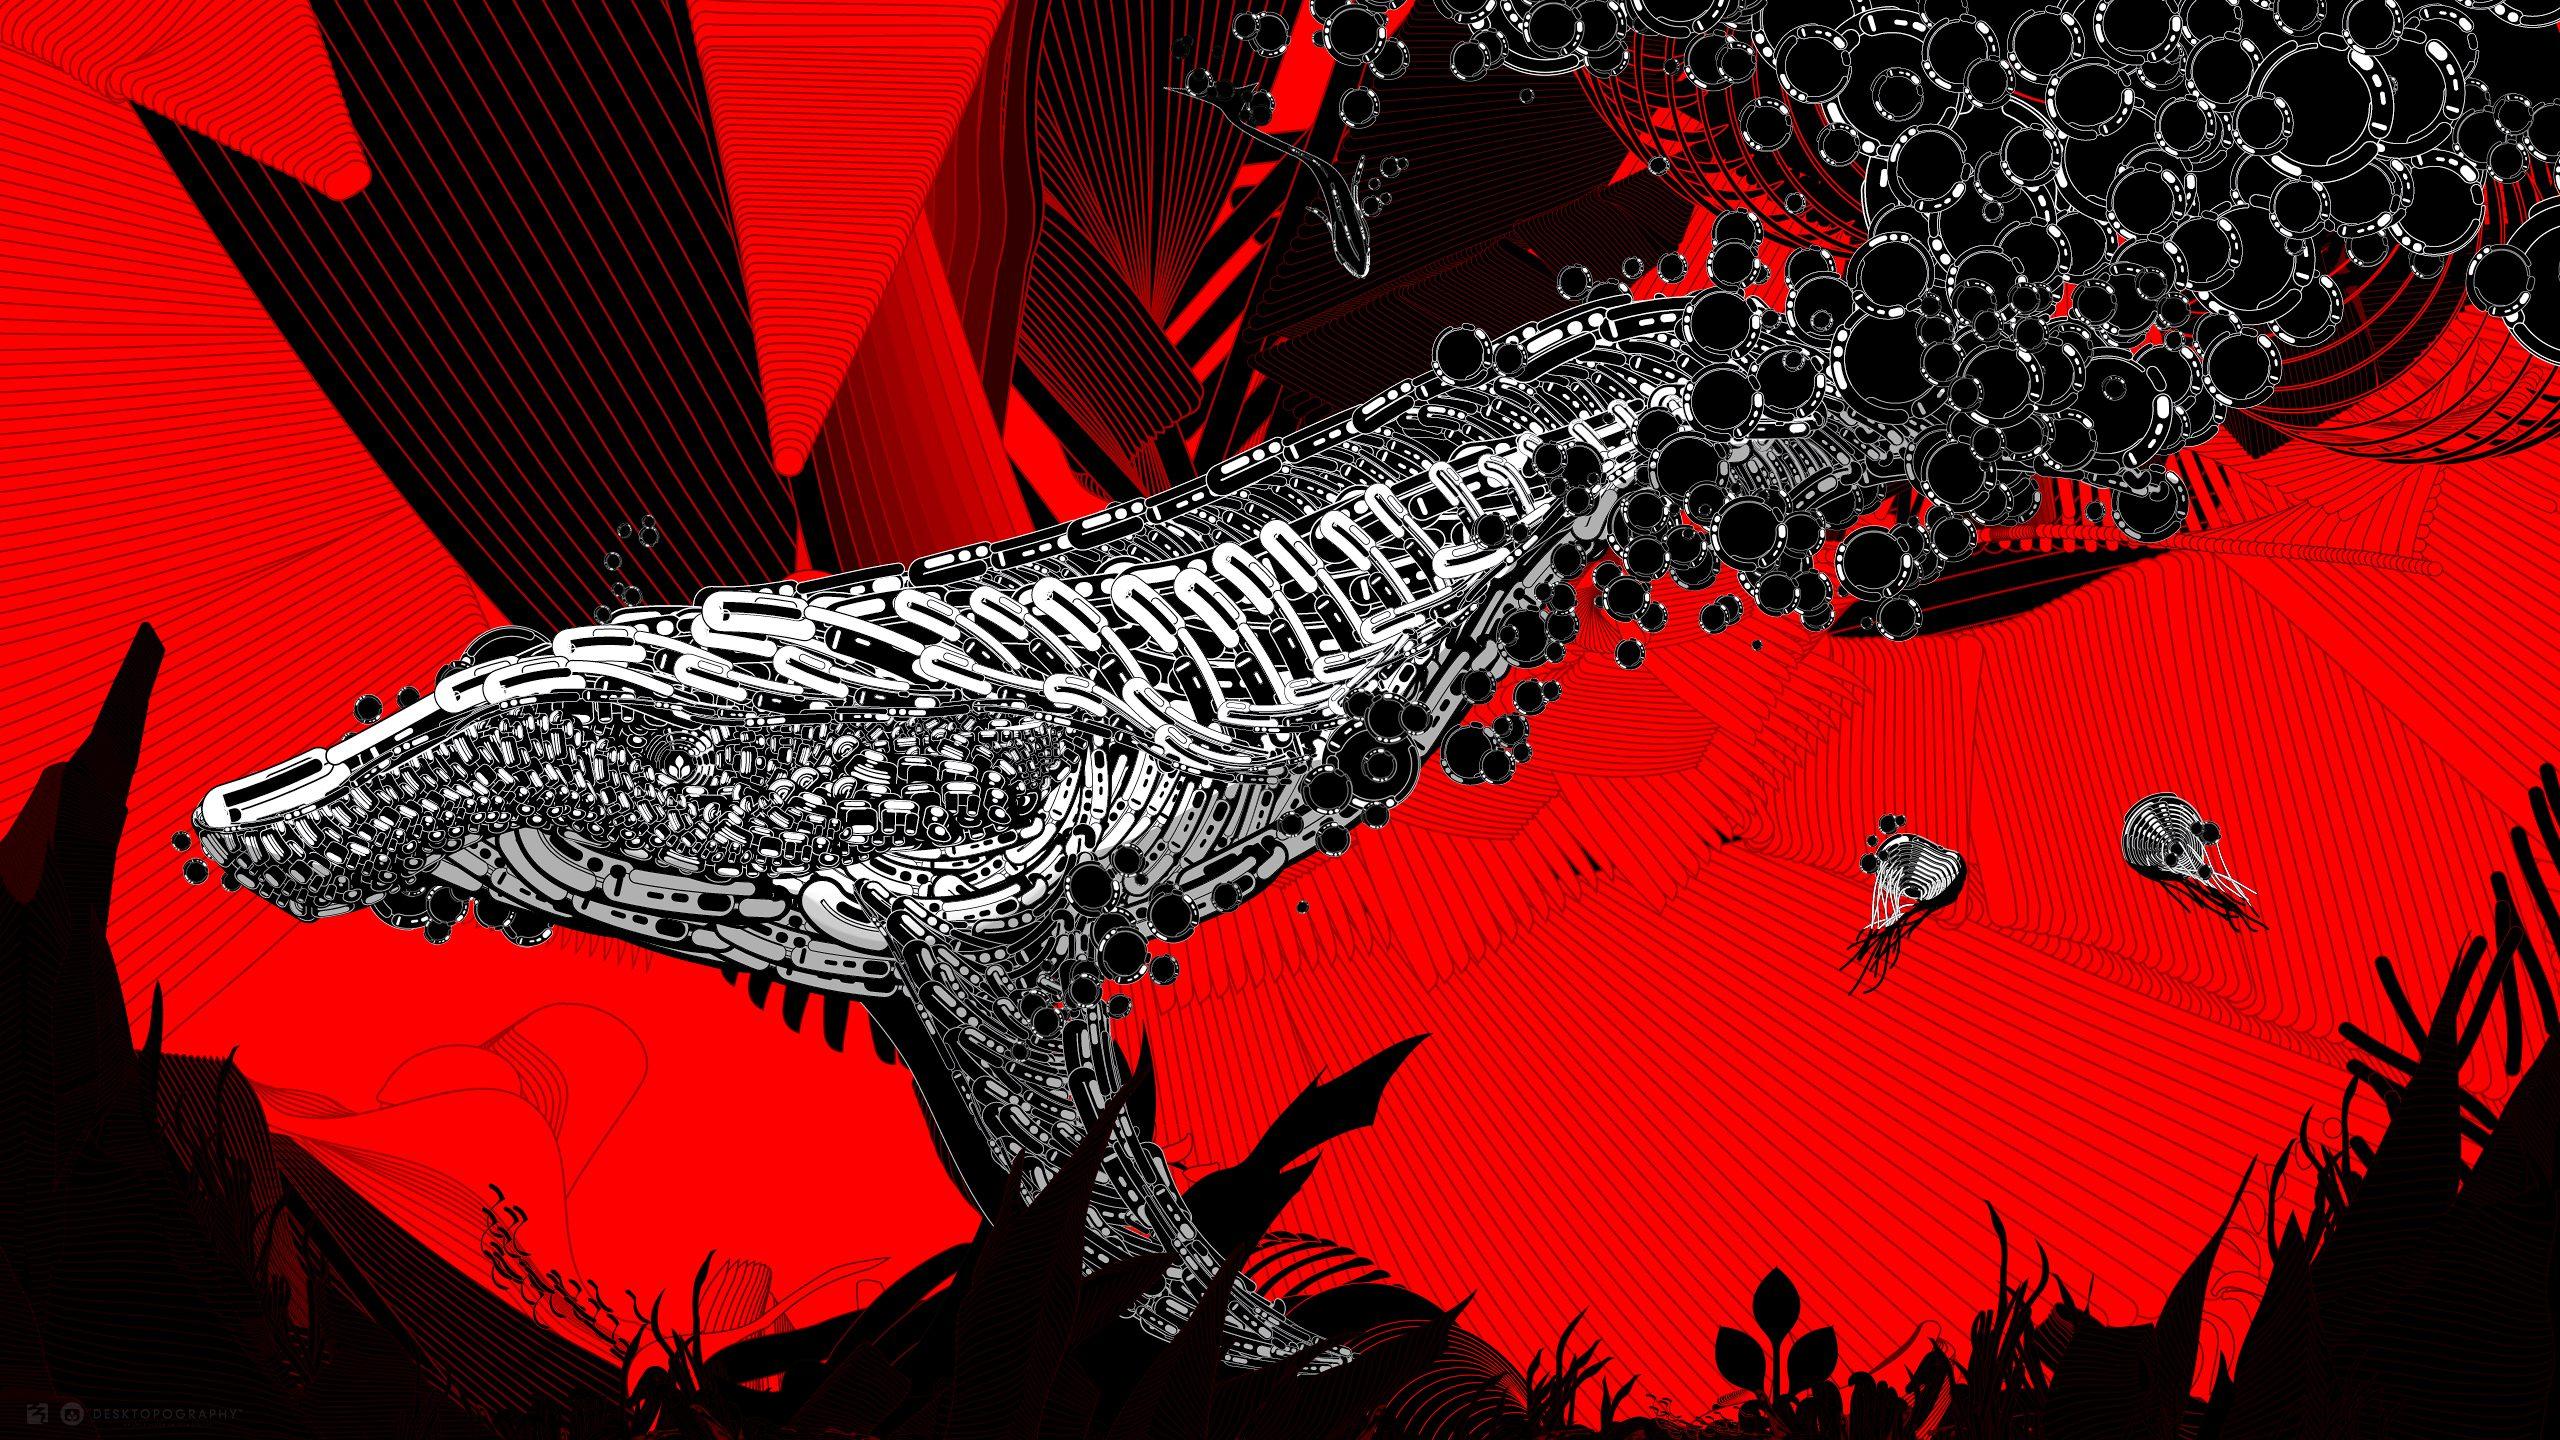 General 2560x1440 Desktopography Photoshop digital artwork whale animals line art jellyfish bubbles red